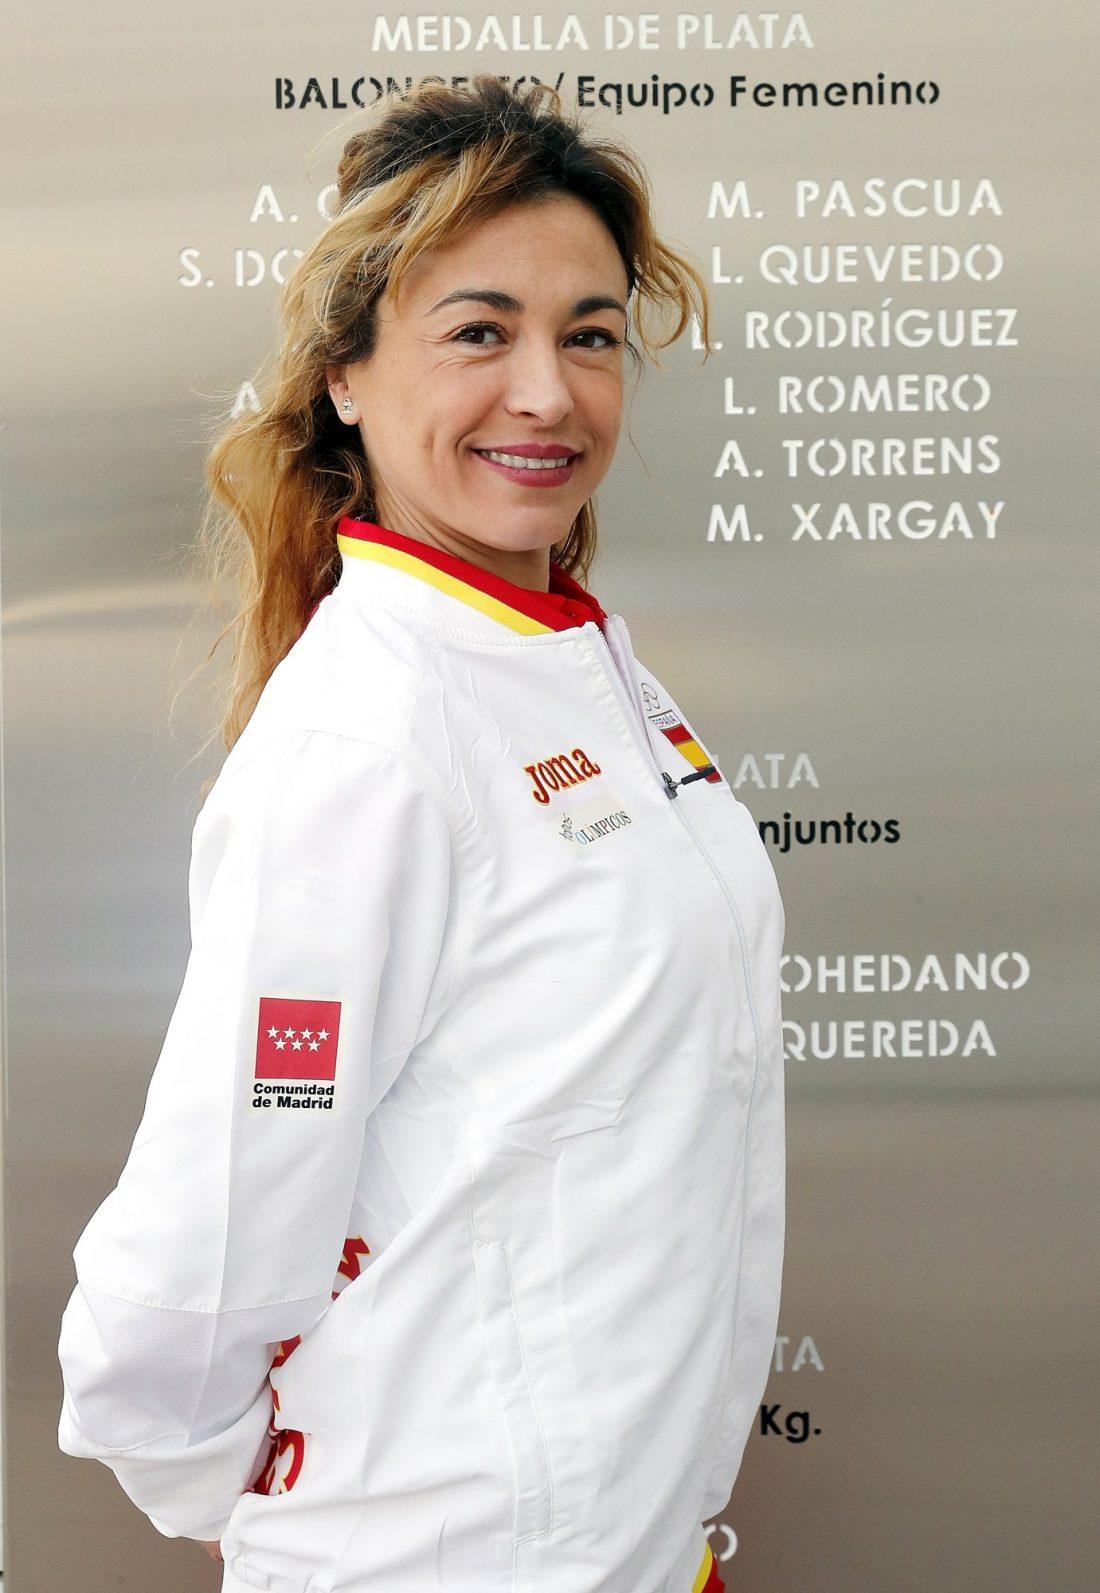 Carplina Pascual